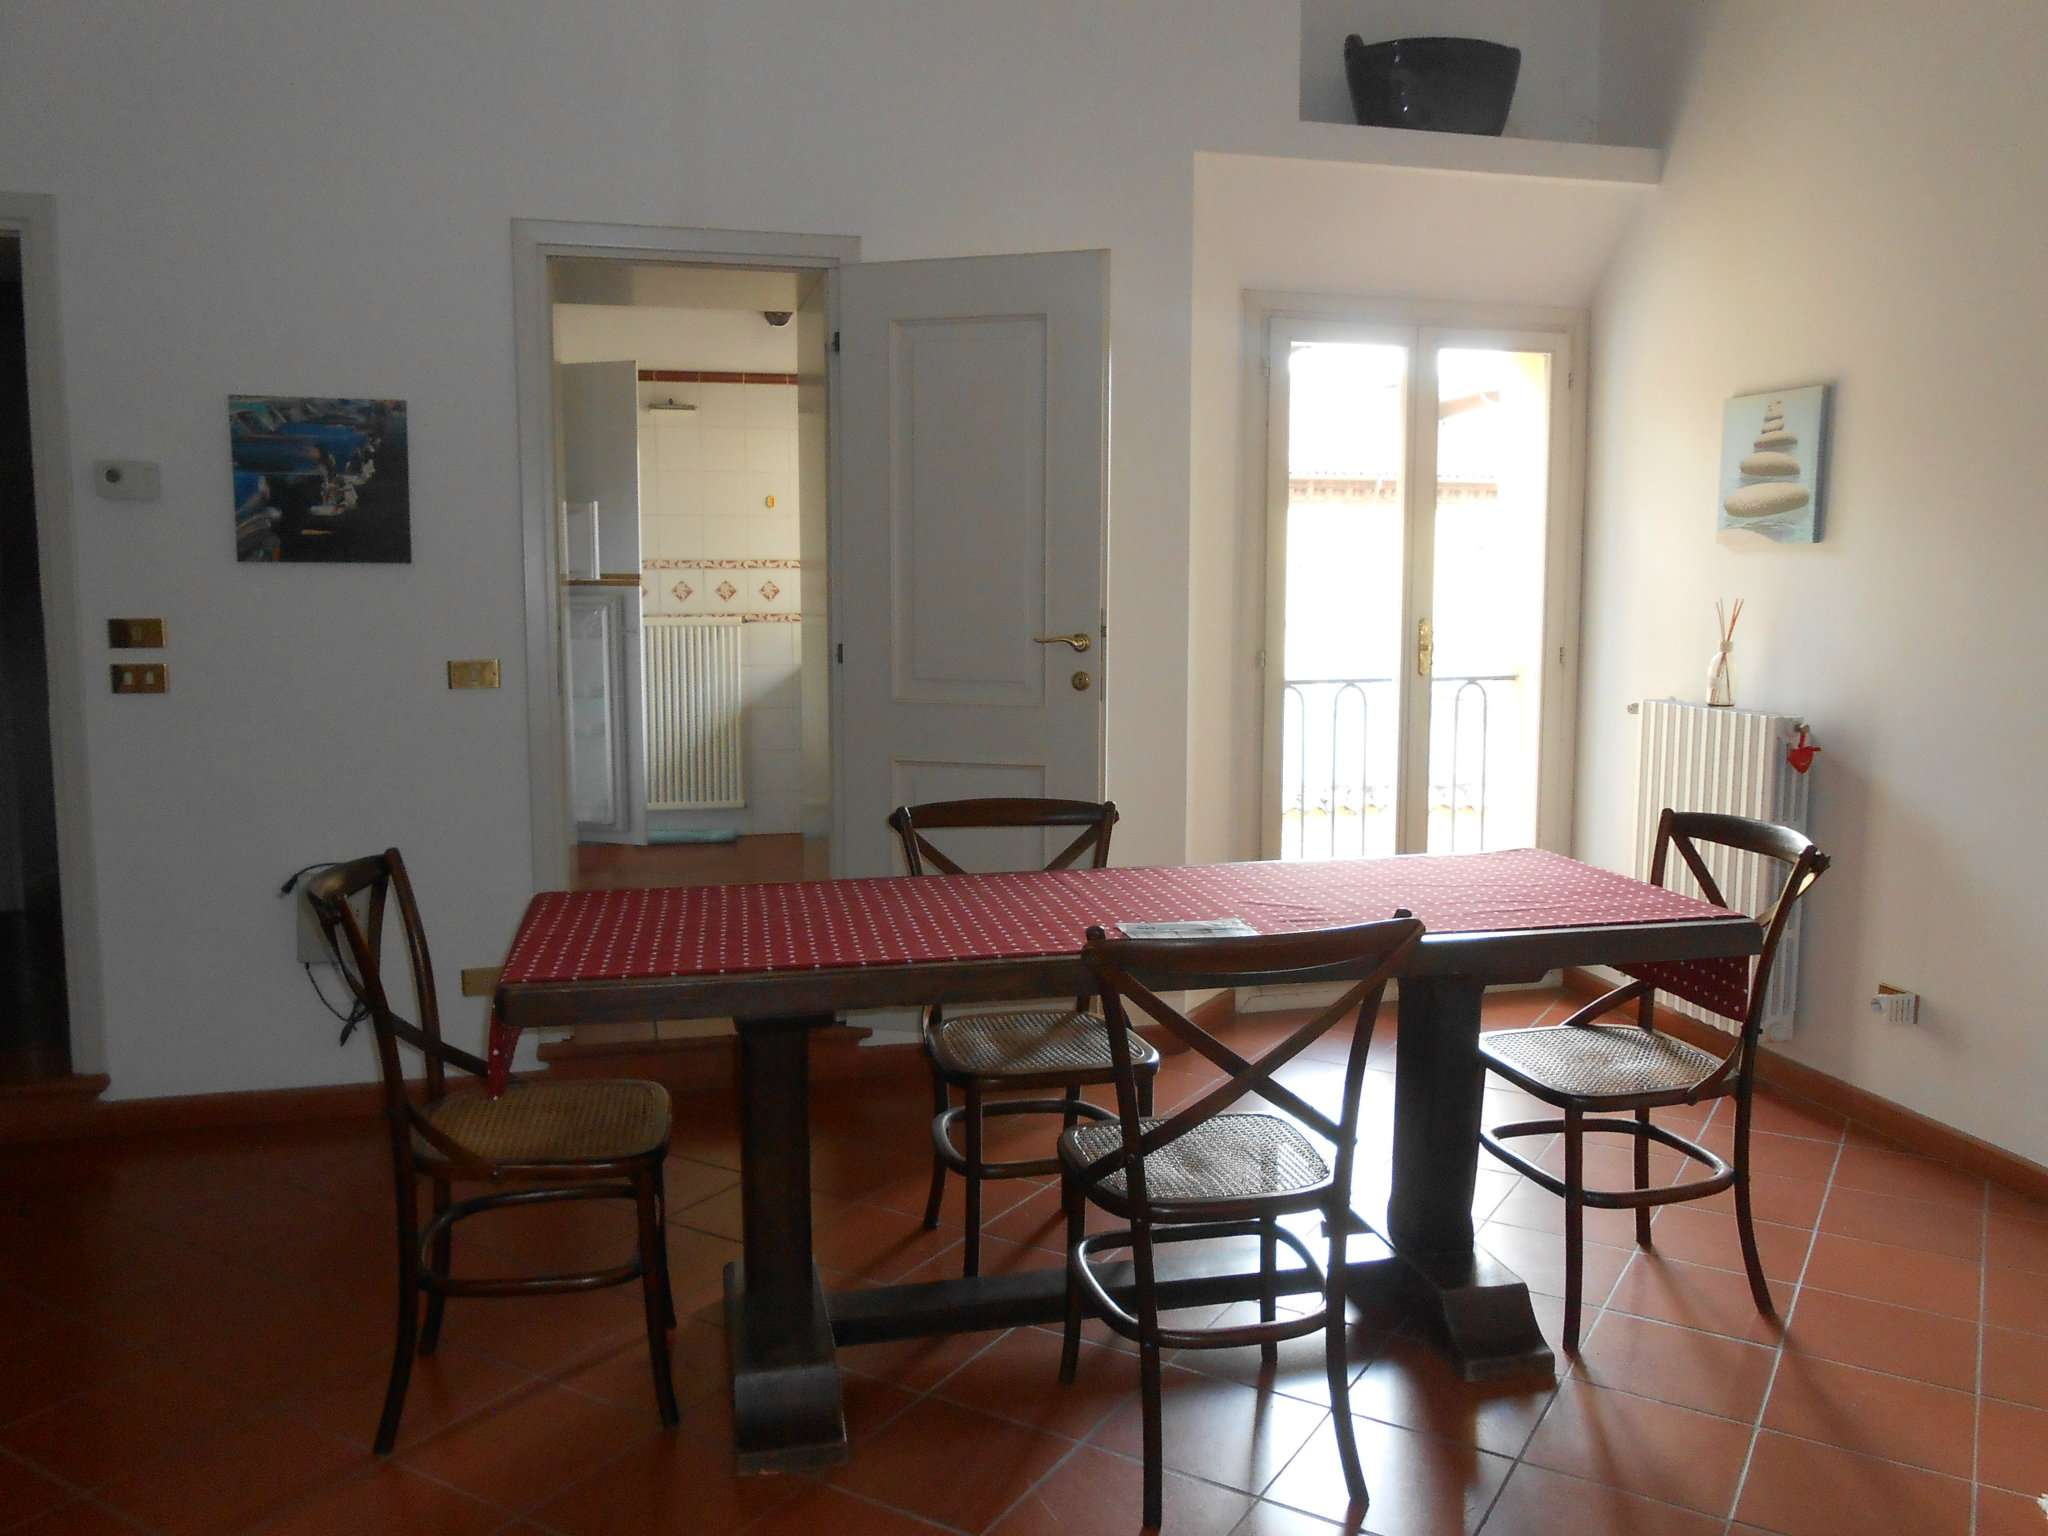 Bologna Bologna Affitto APPARTAMENTO » appartamentio in vendita a torino